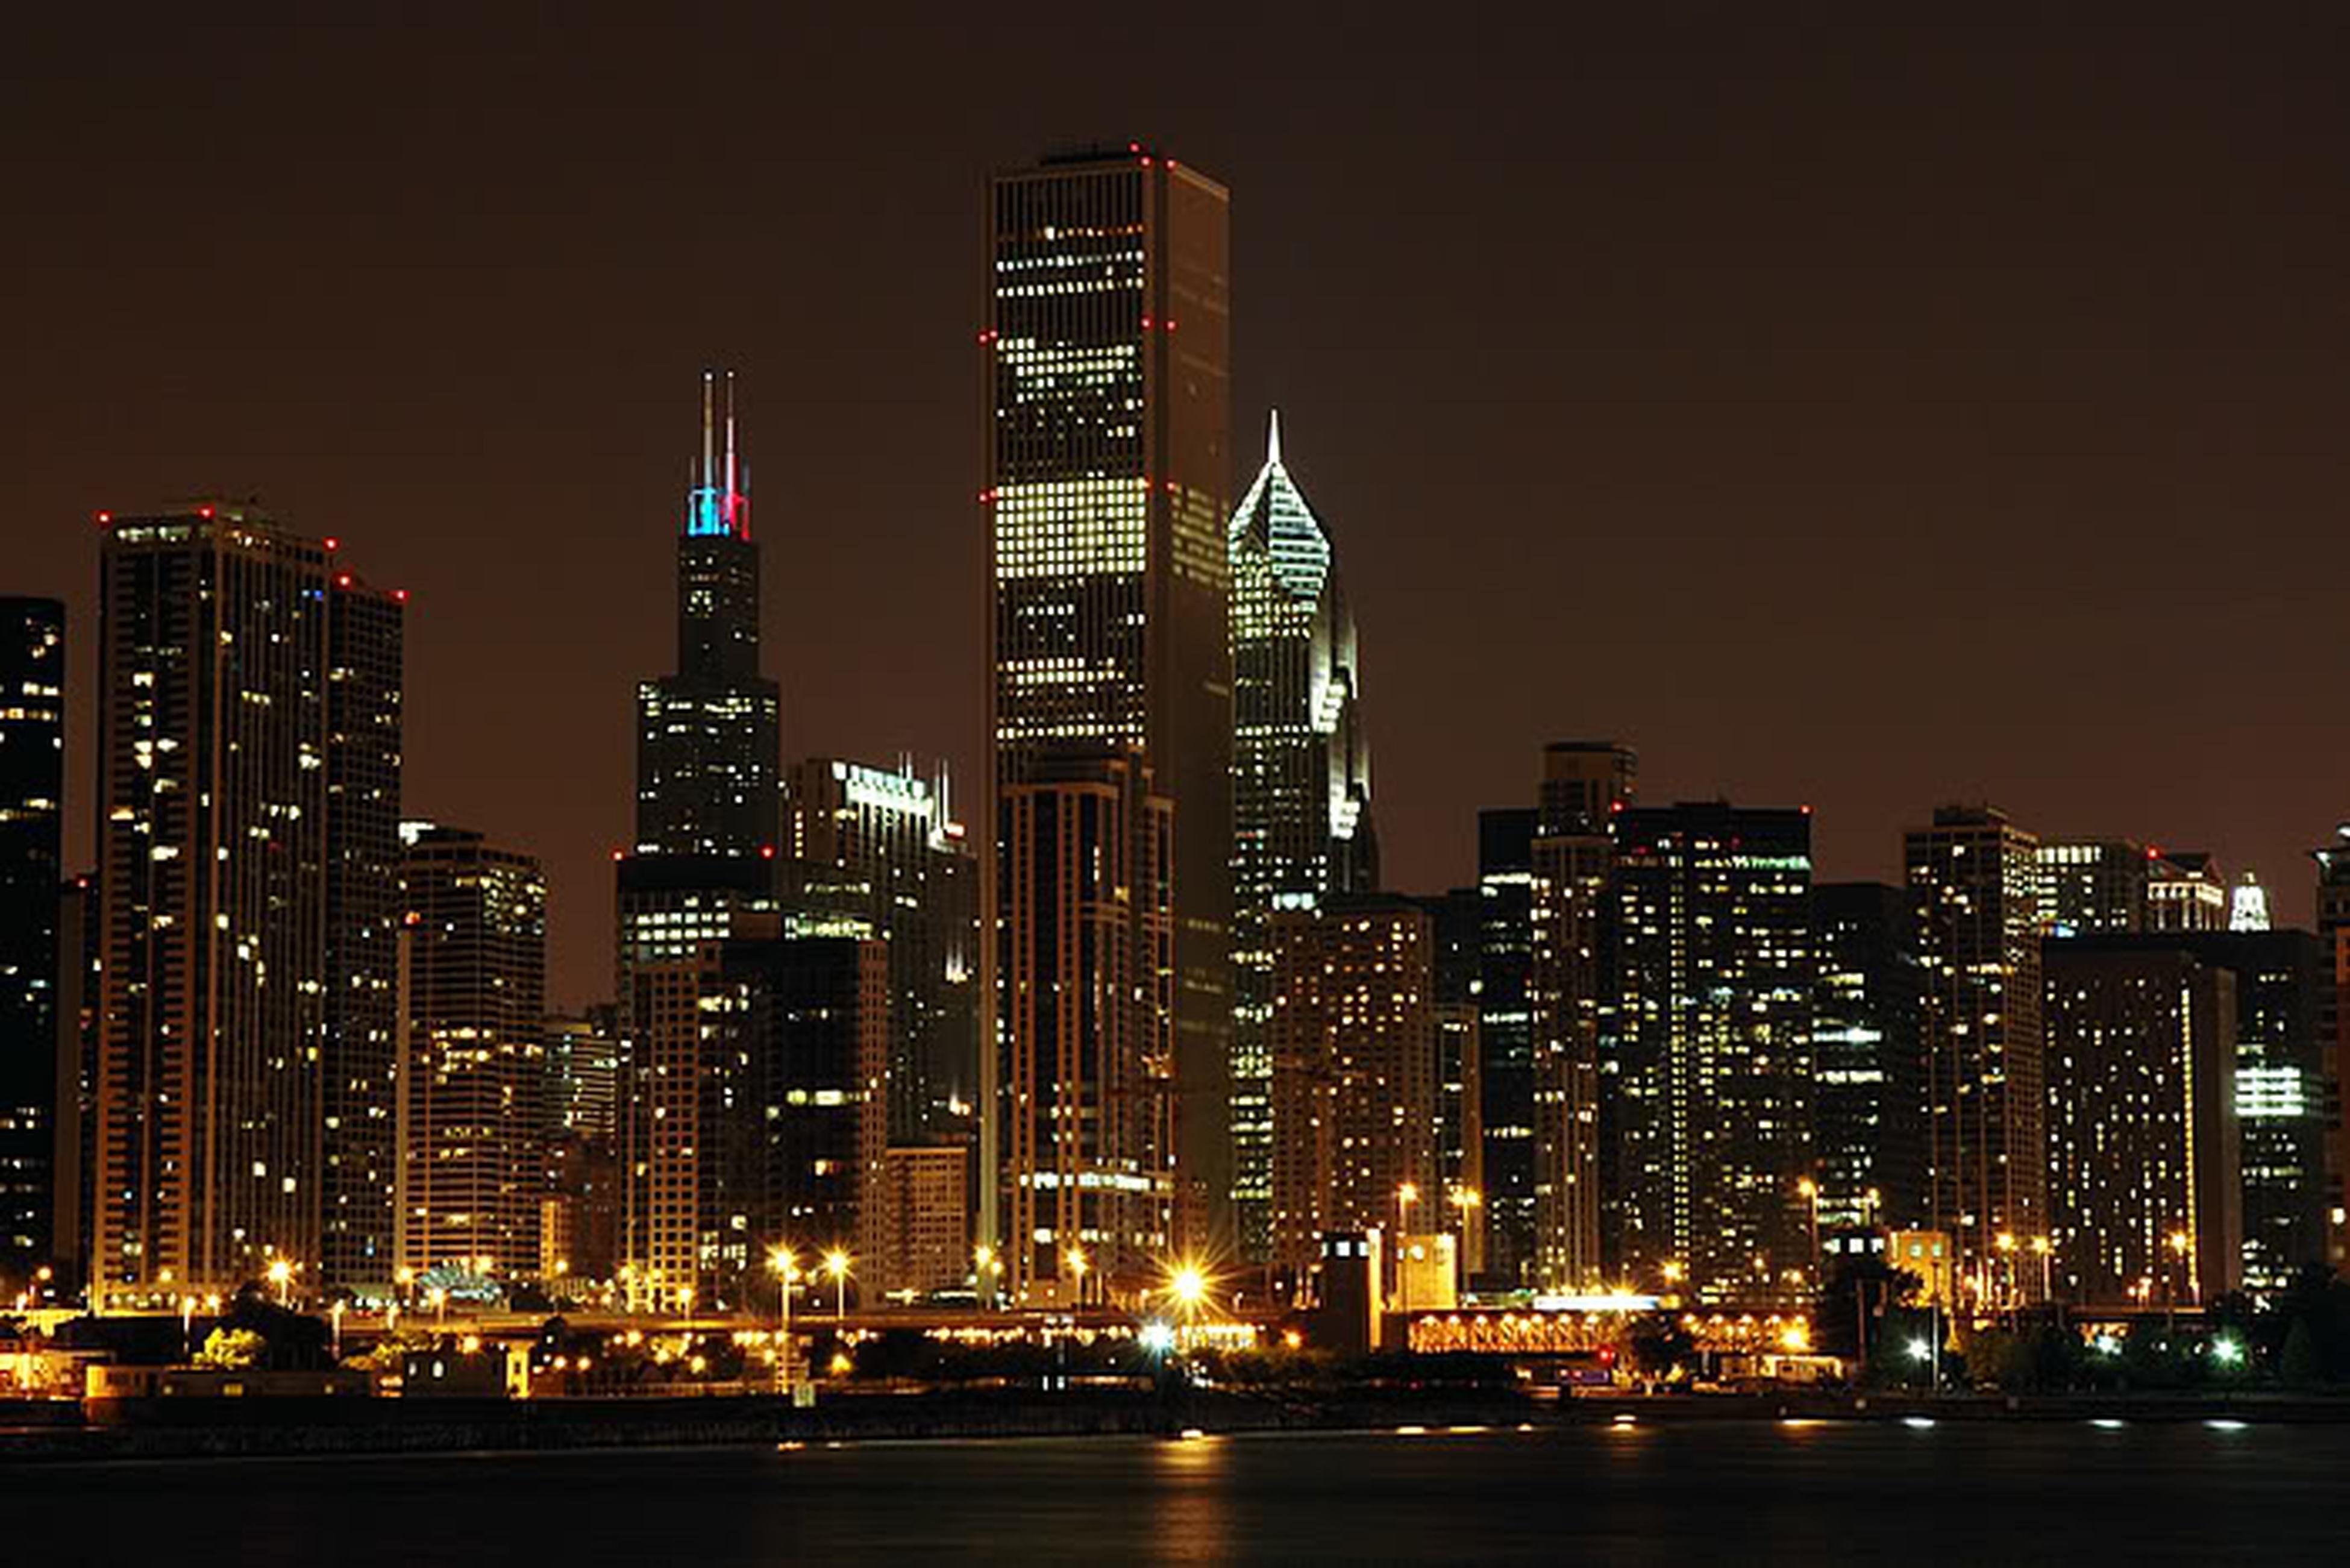 Chicago Love It Late Night, City Night, ;)